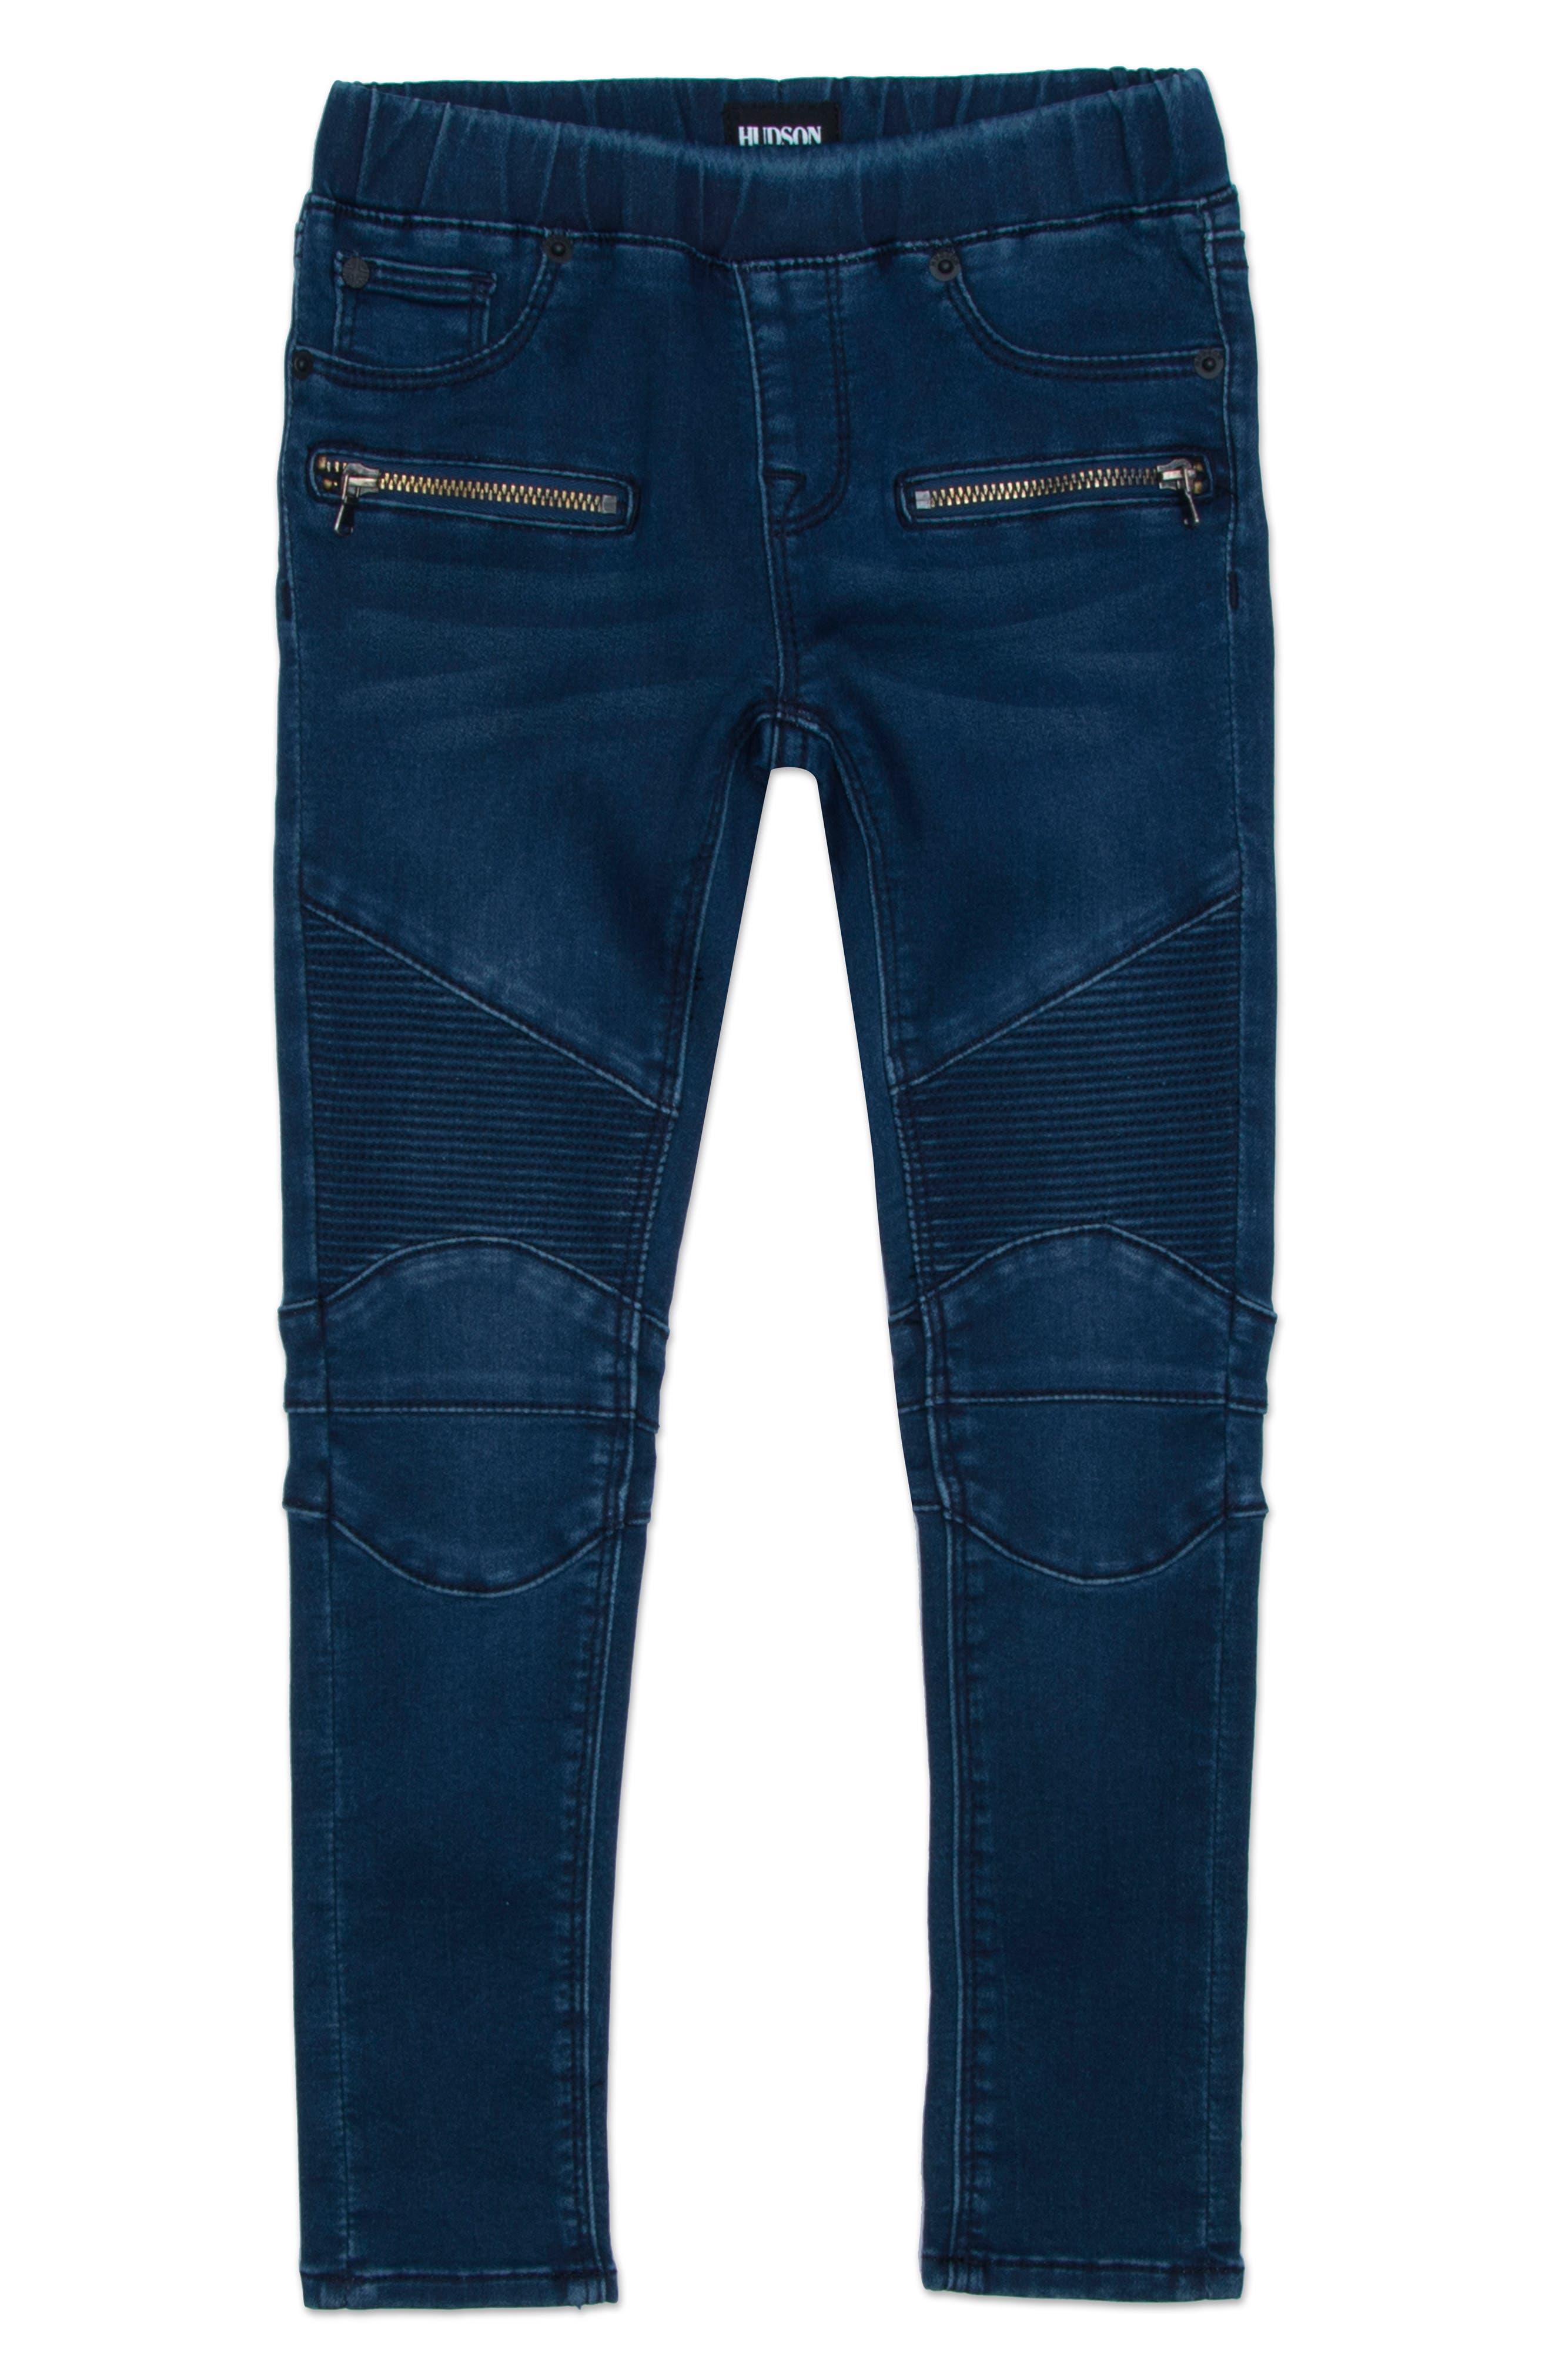 Main Image - Hudson Kids Moto Skinny Jeans (Baby Girls)